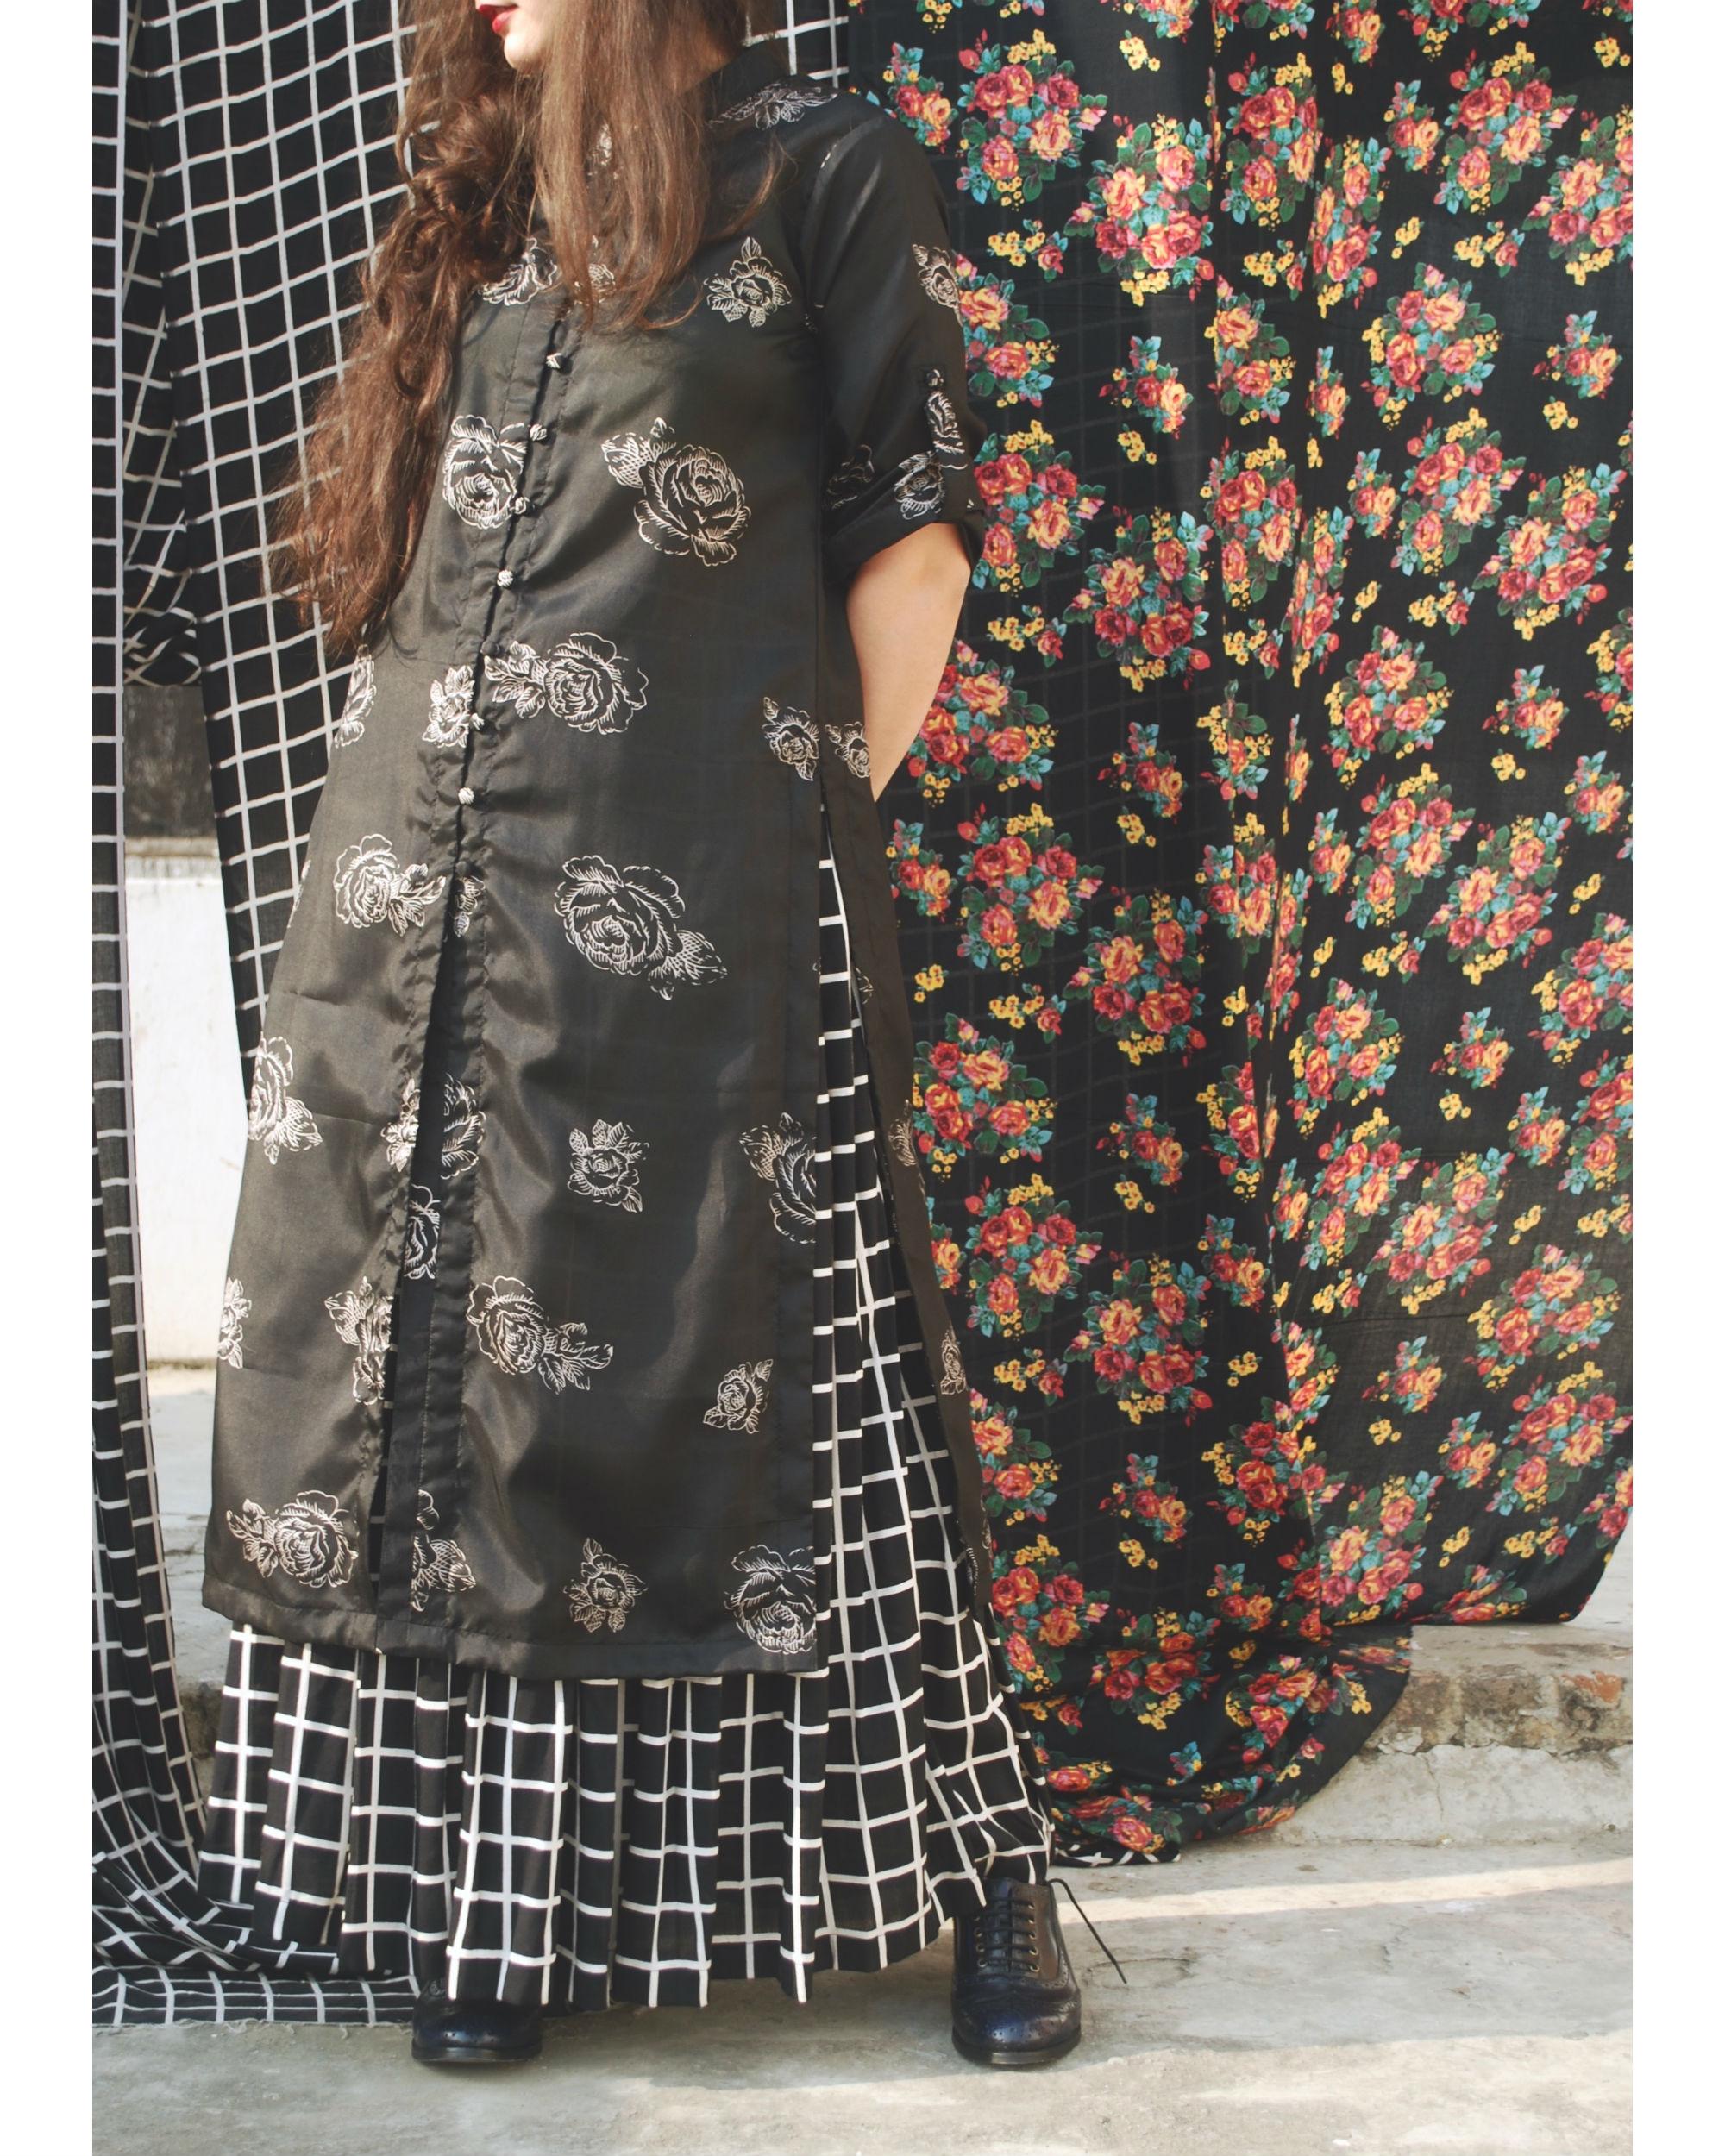 Black rose tunic